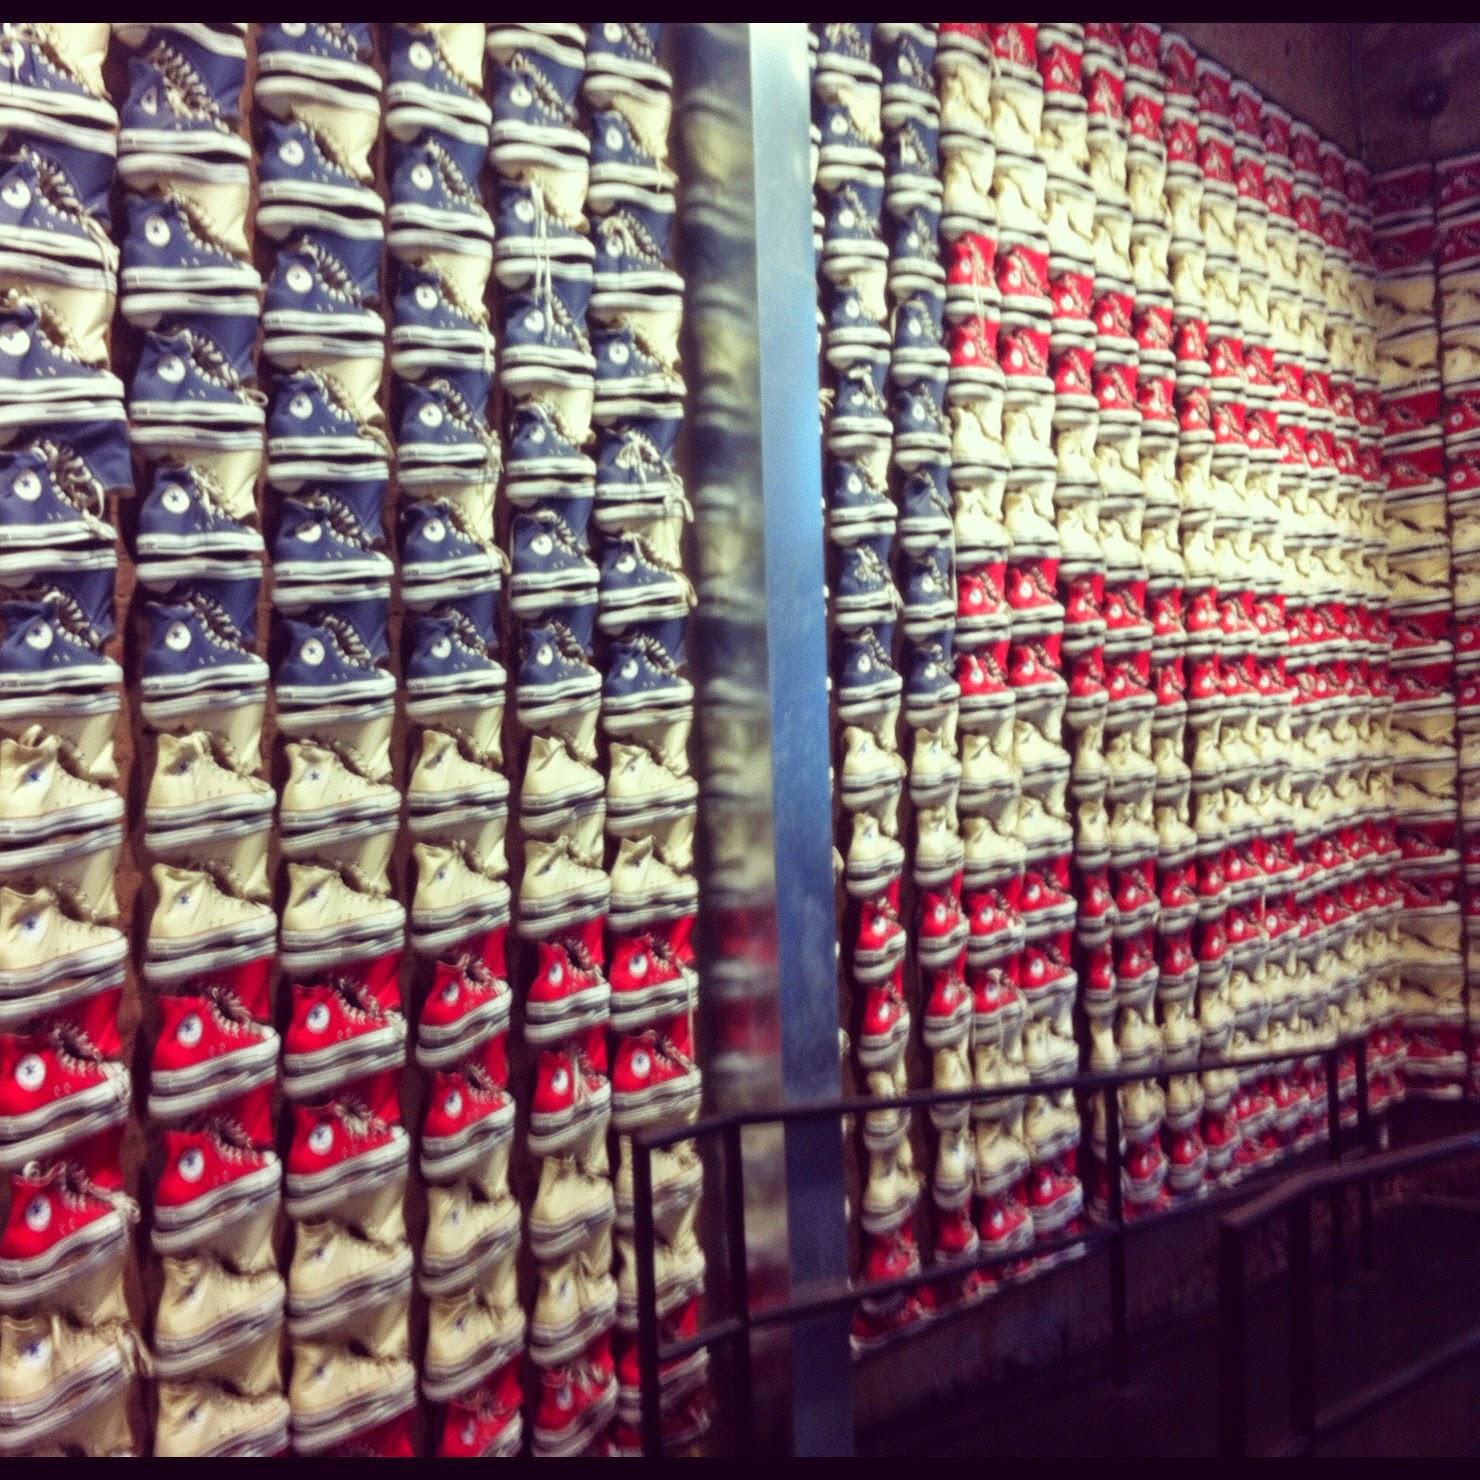 Converse Shoes Soho New York